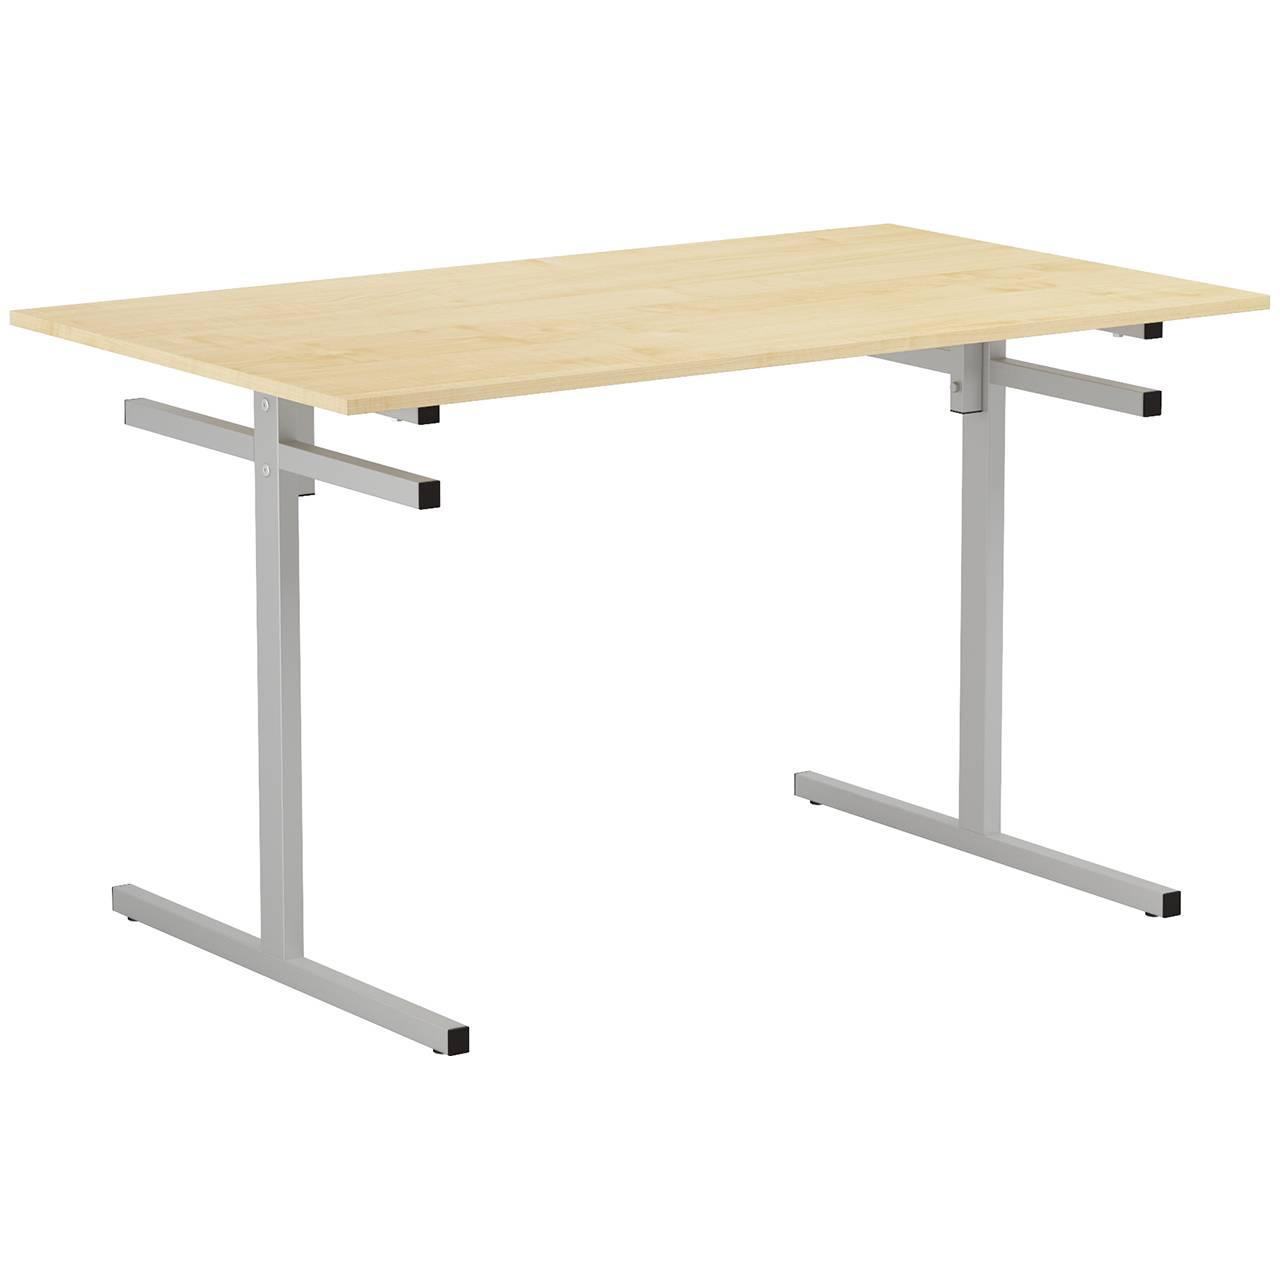 Стол для столовой 4-местный для скамеек (гр. 5,6) серый Клен 6 Пластик